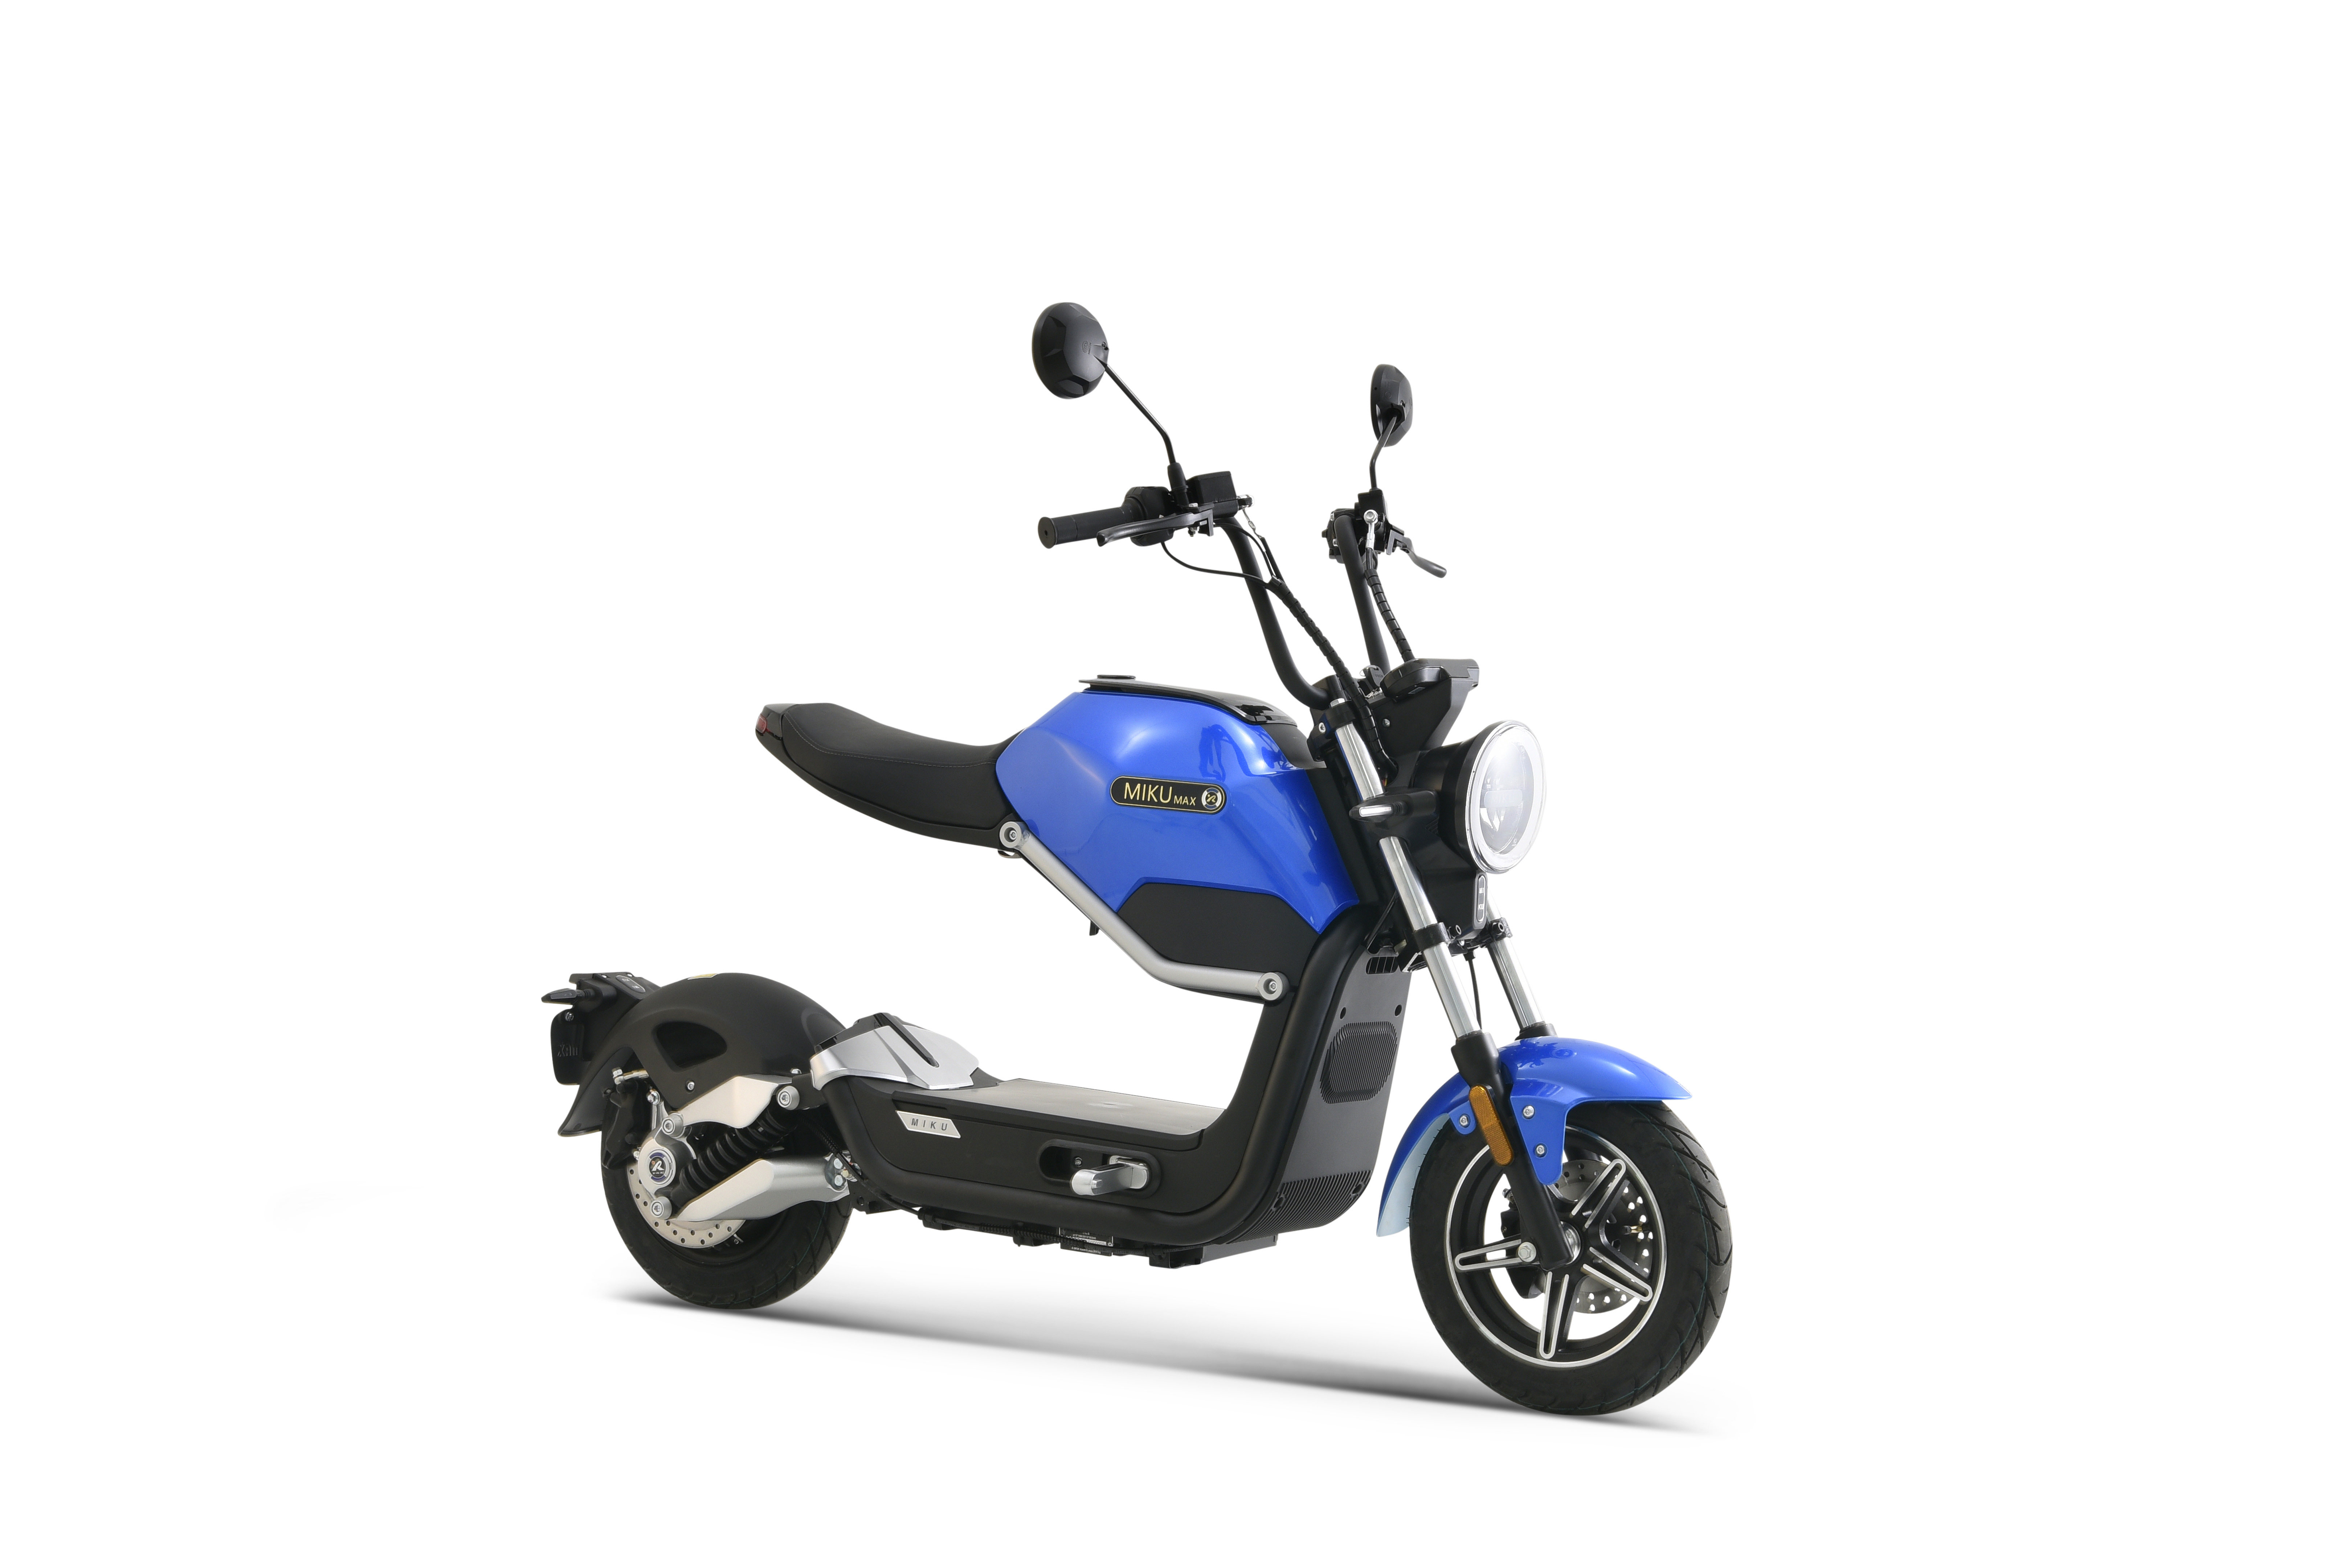 Miku Max Betaalbare Hippe Elektrische Scooter